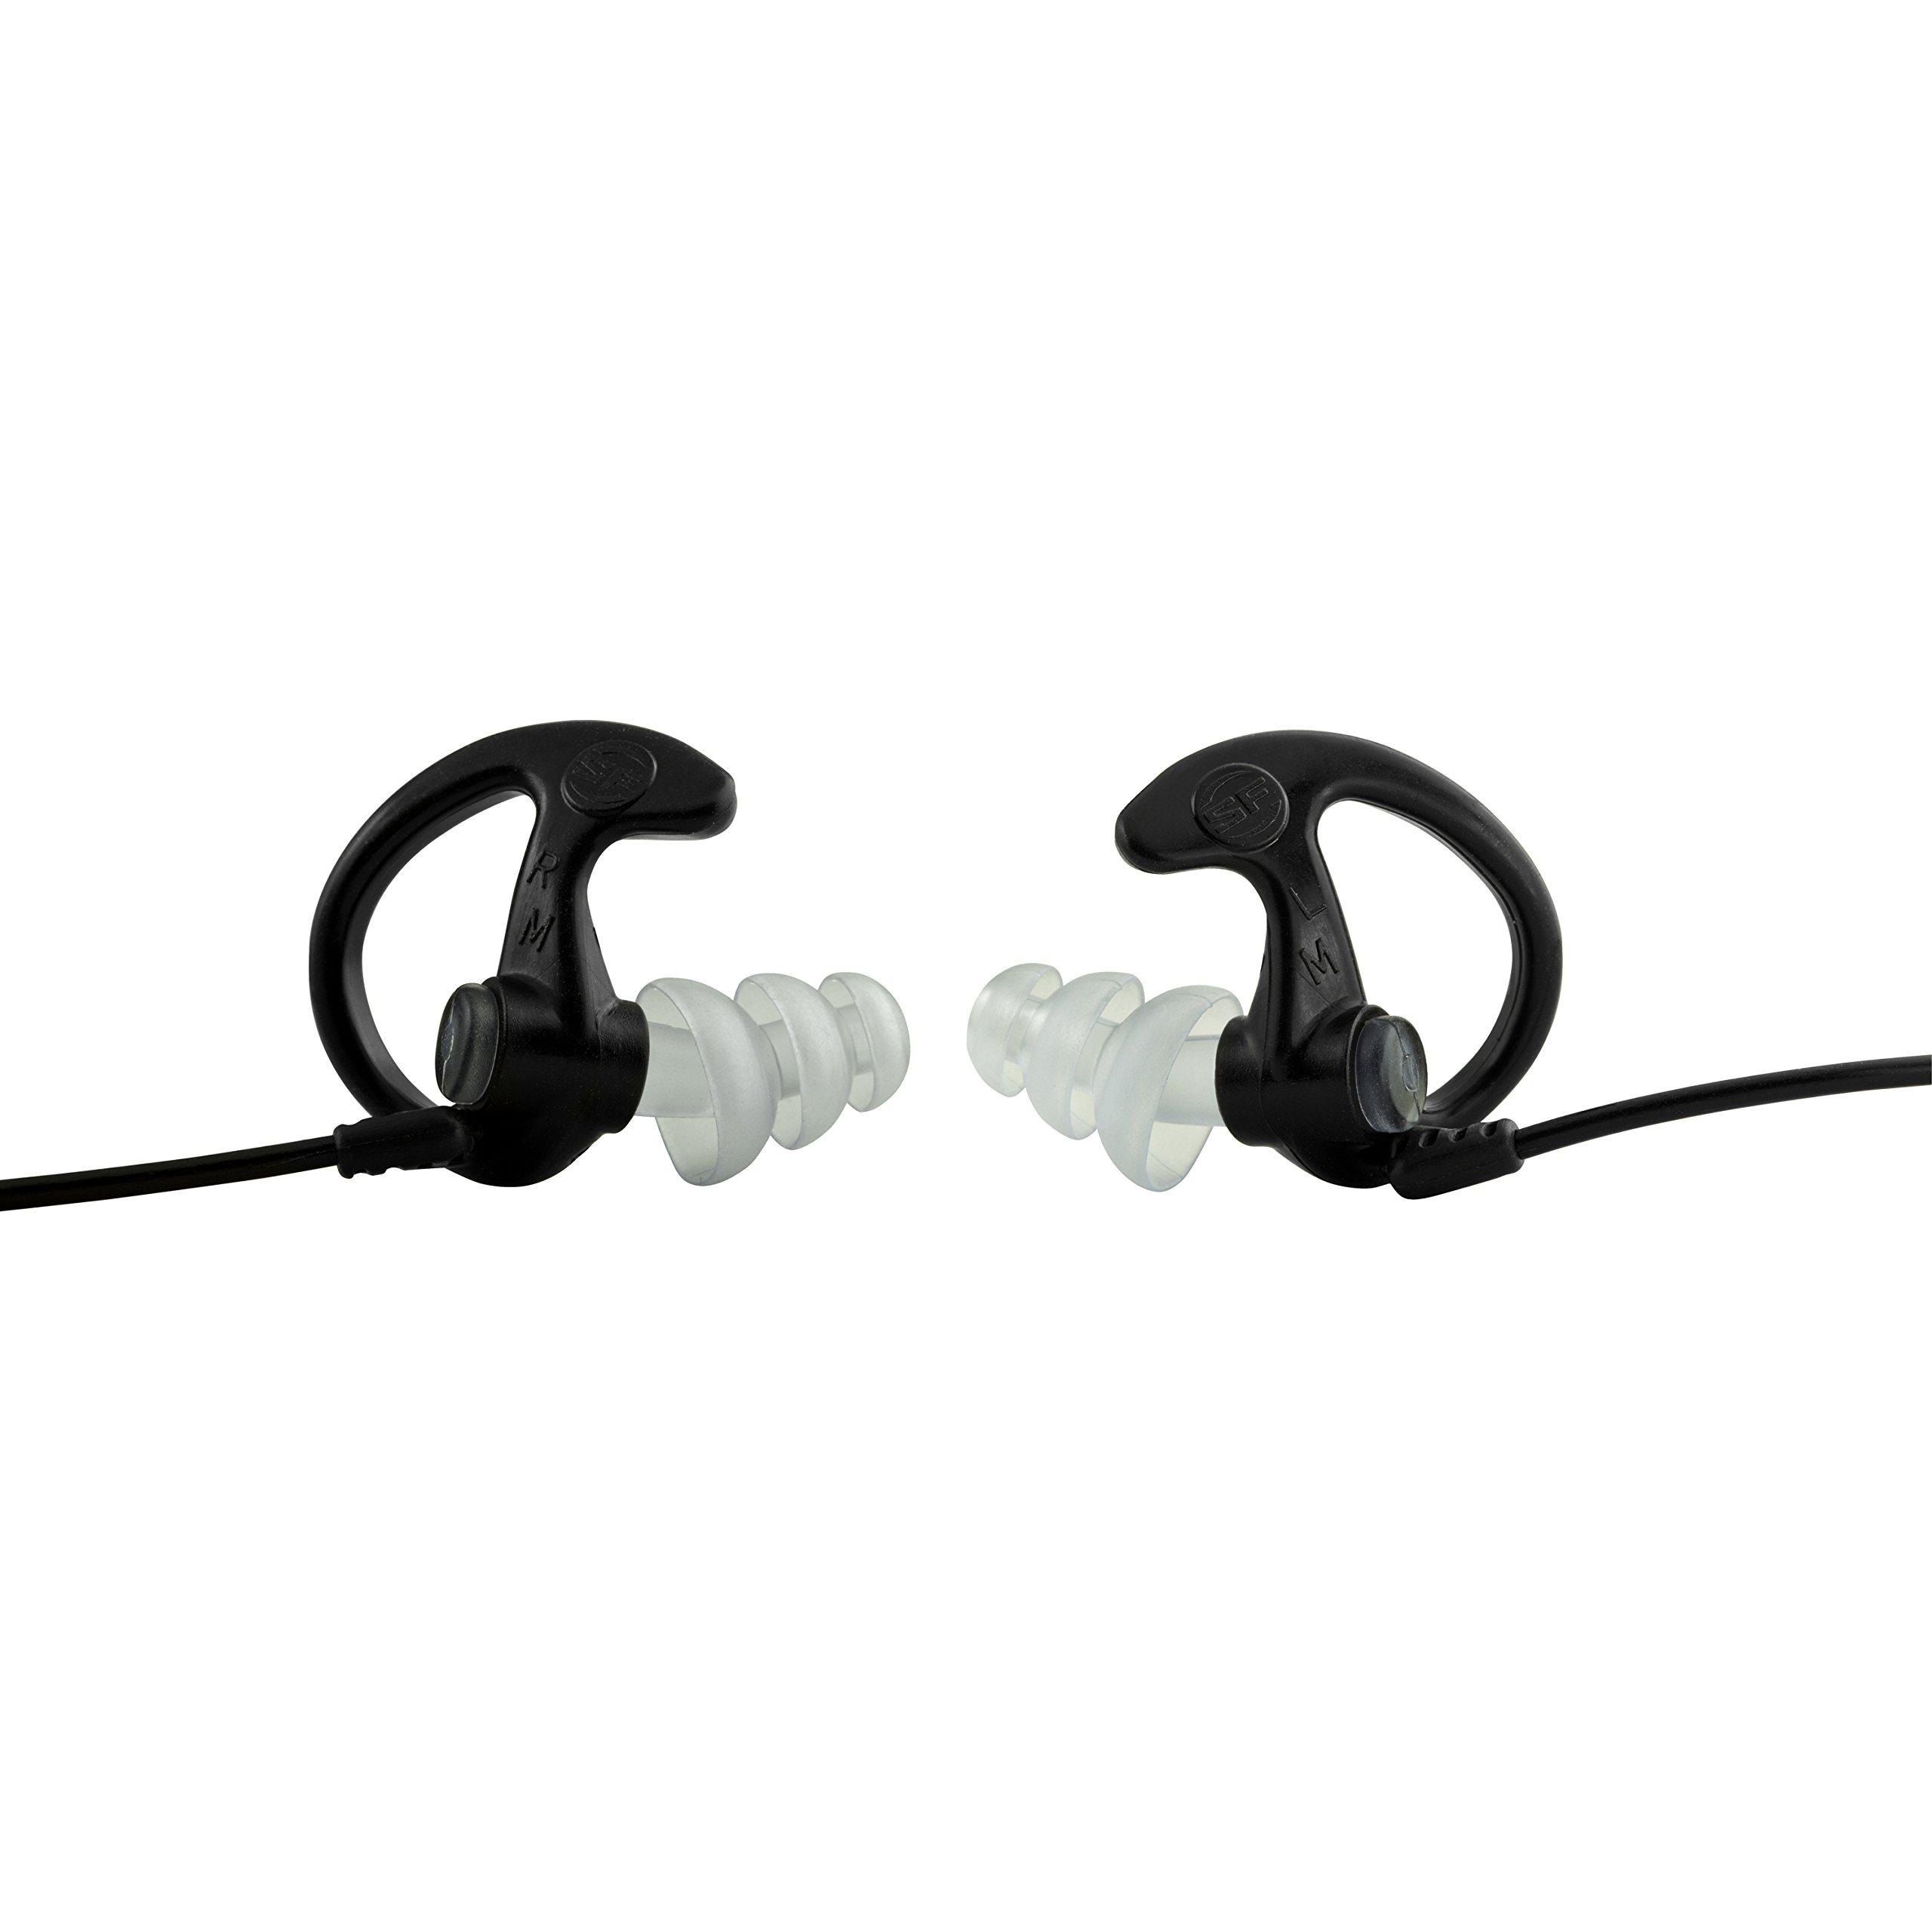 Ear Pro By Surefire Sonic Defender Ear Plugs (25-Pair) Black, Small